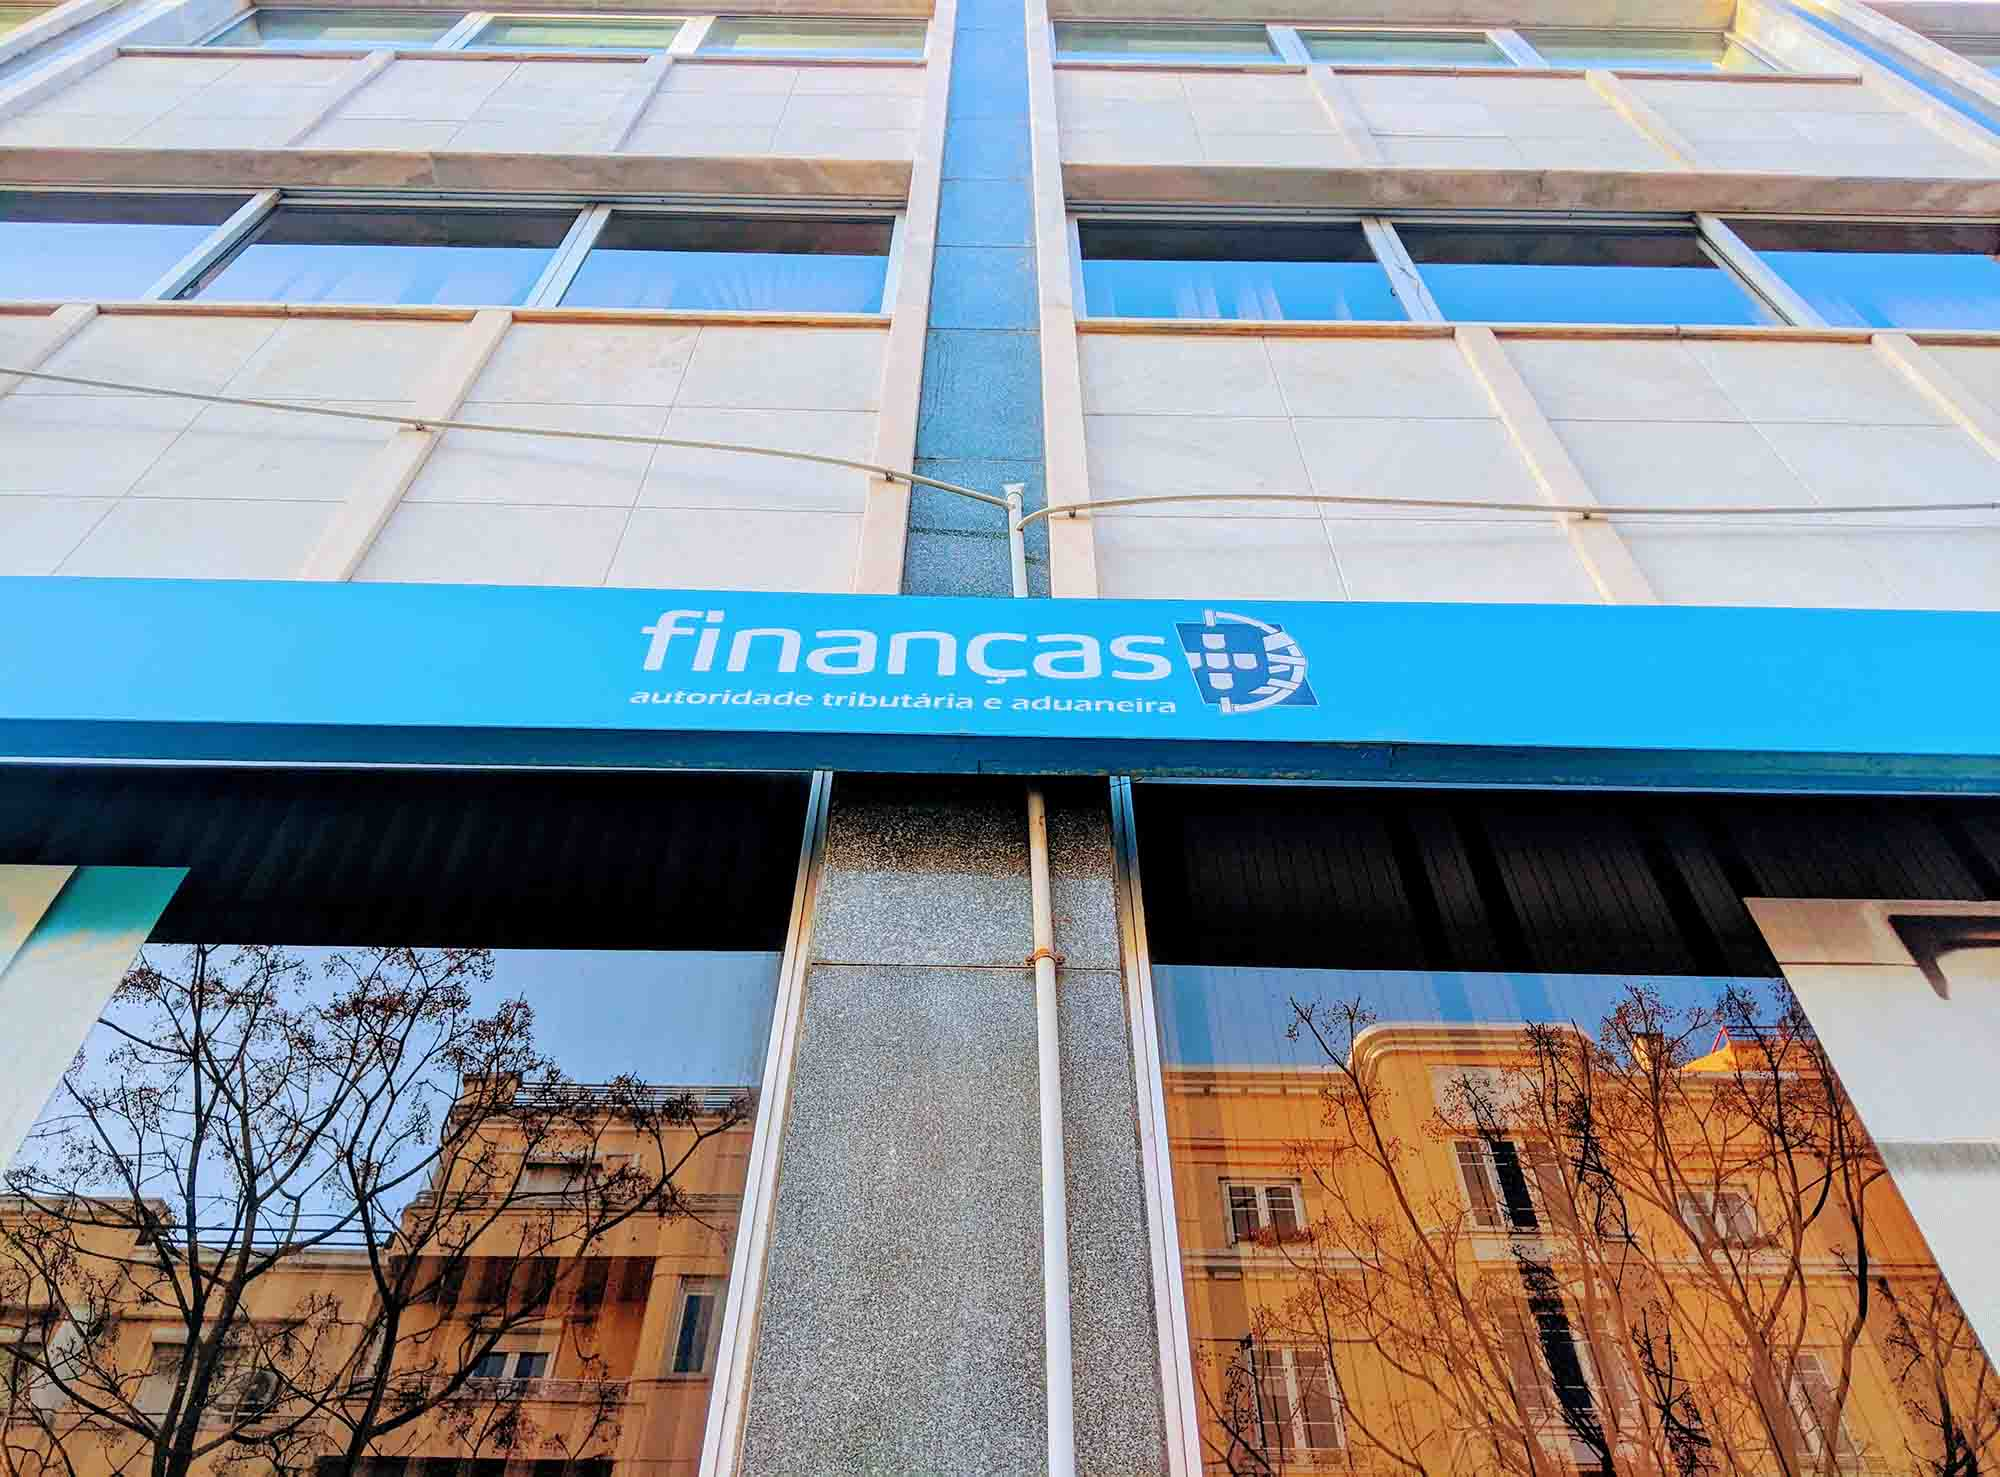 financas building